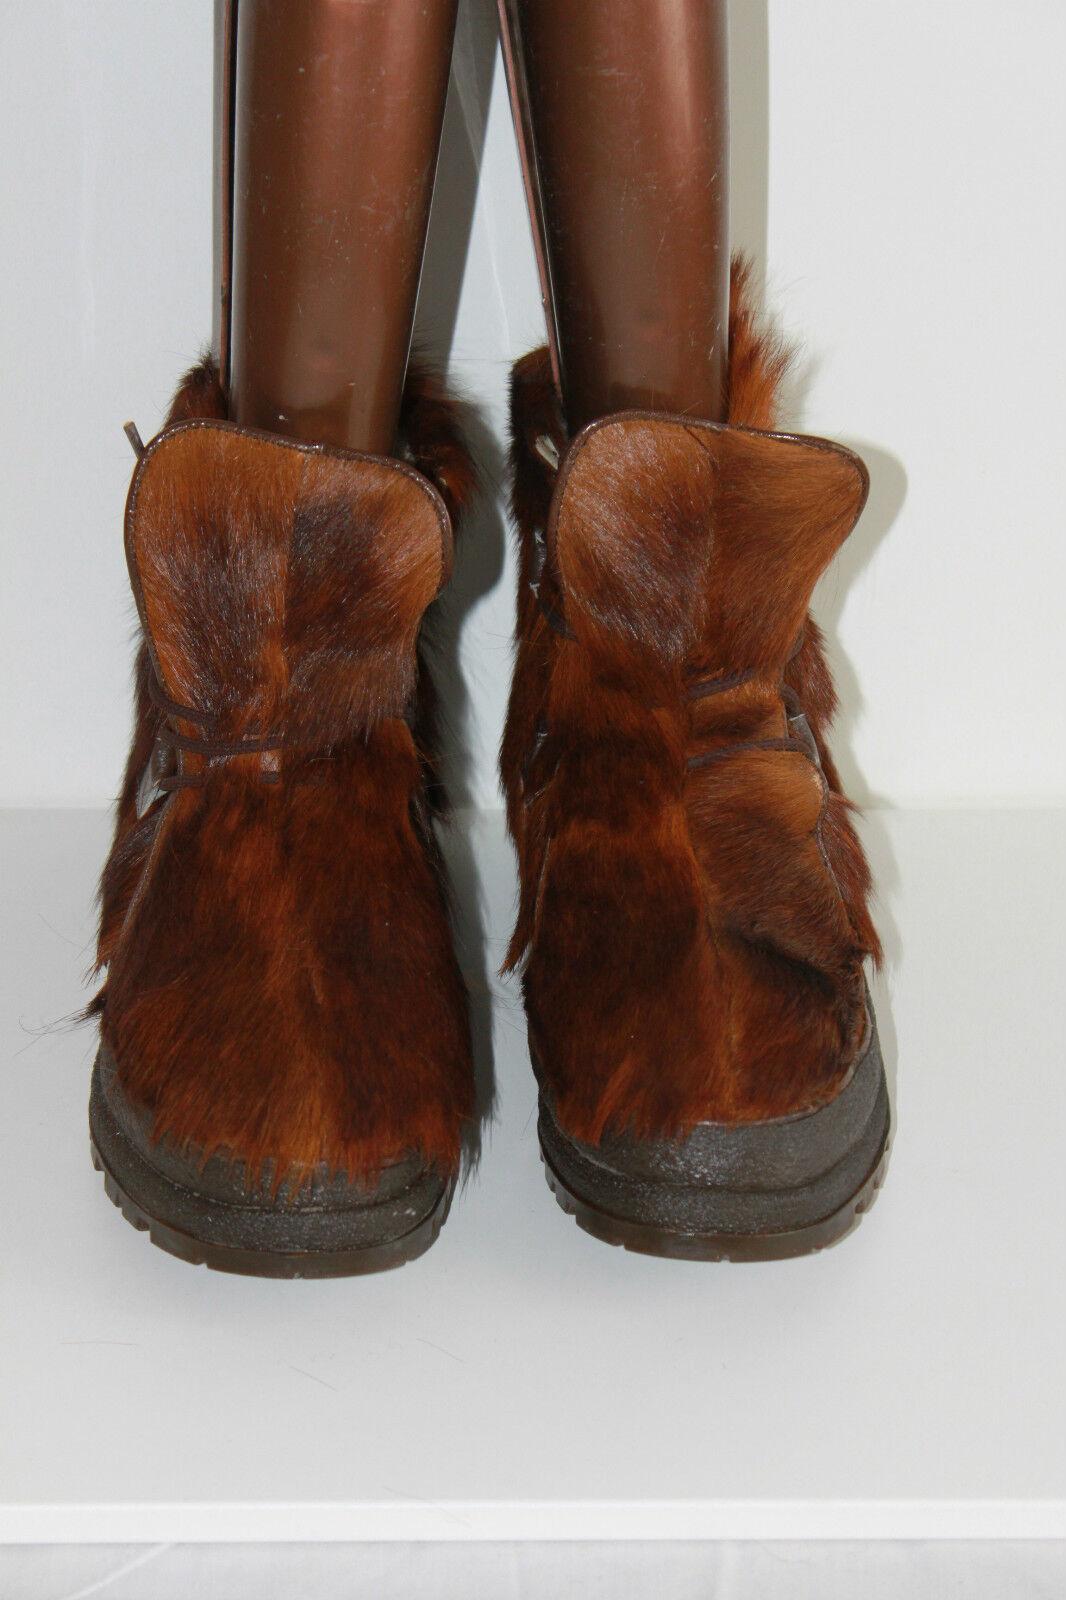 VINTAGE Boots Stuffed VALLOIRE VALLOIRE VALLOIRE Fur Goatskin T 41 VERY GOOD CONDITION 0b74a1